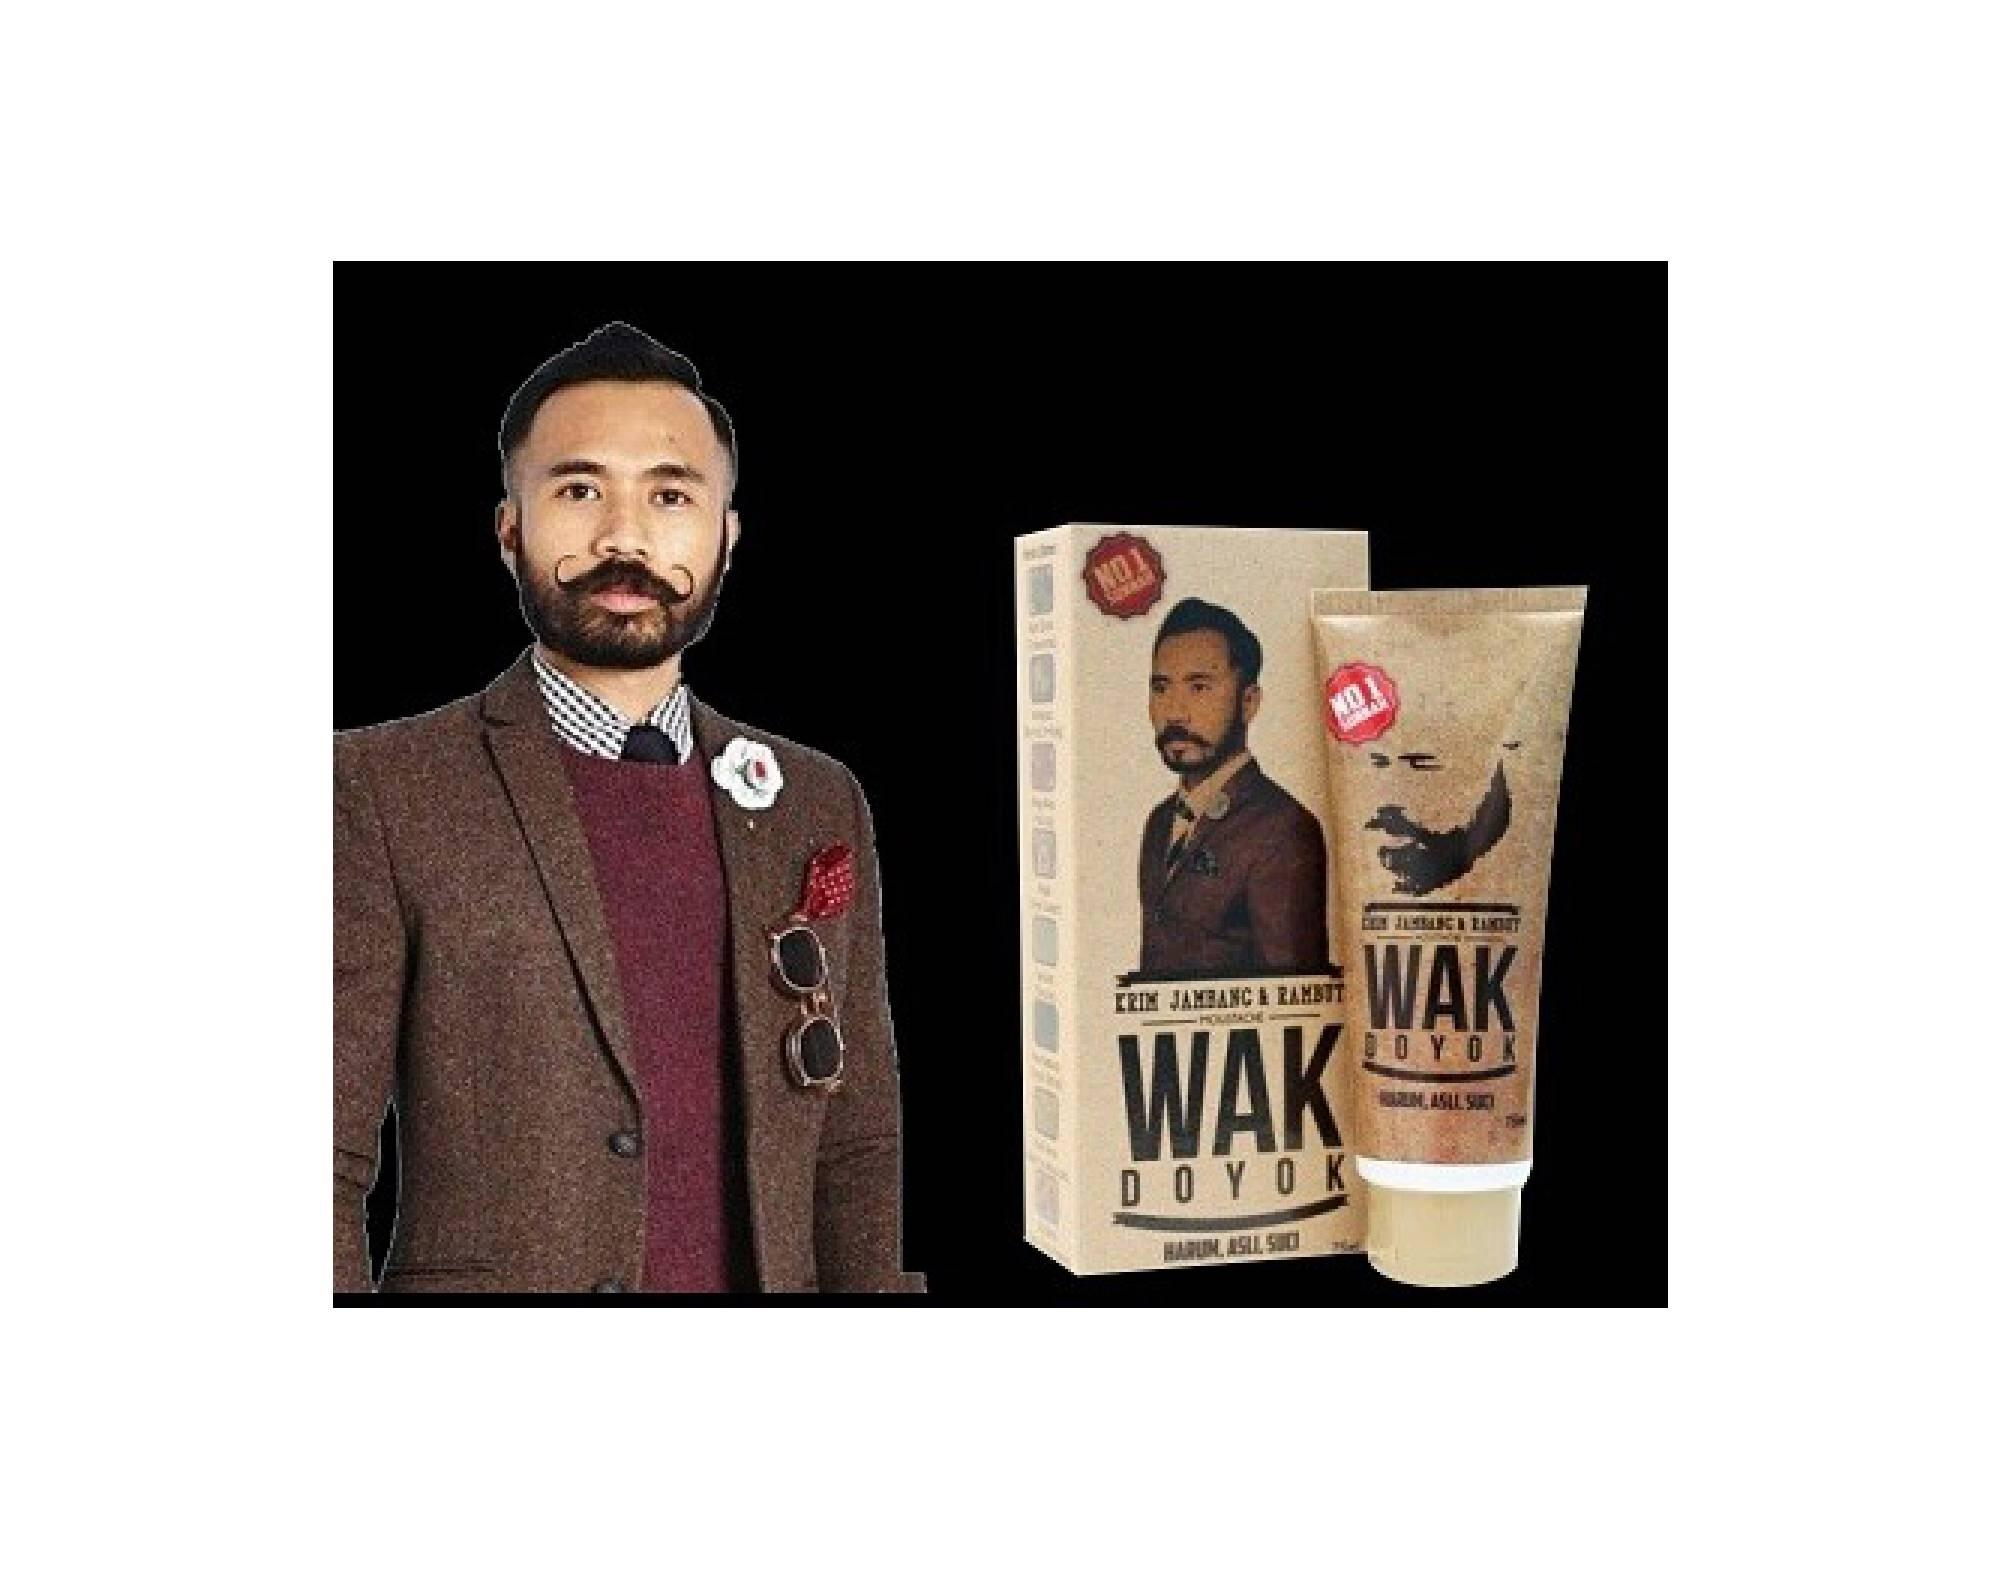 Cream Wak Doyok Wakdoyok Original Penumbuh Rambut Kumis Jenggot Kemasan Hemat Sample Jambang Alis Rambutimport Malaysia Krim Bewok